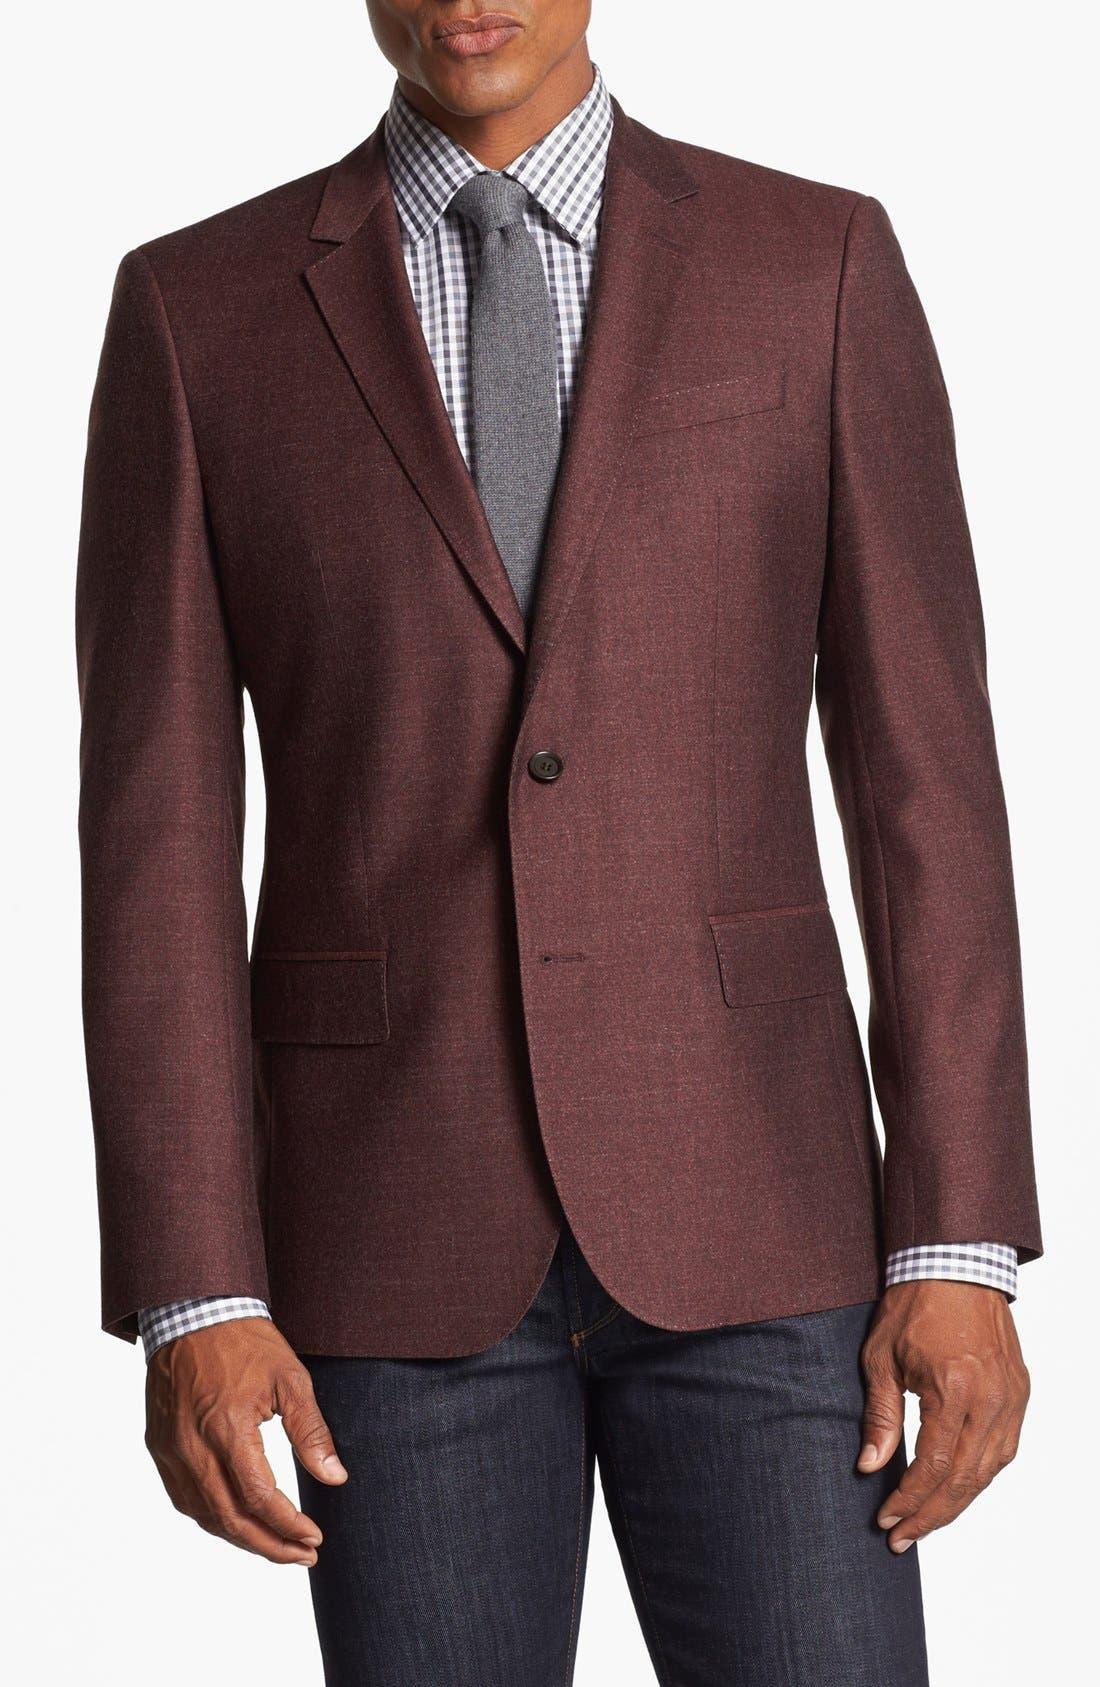 Alternate Image 1 Selected - BOSS HUGO BOSS 'Hutch' Trim Fit Wool Blazer